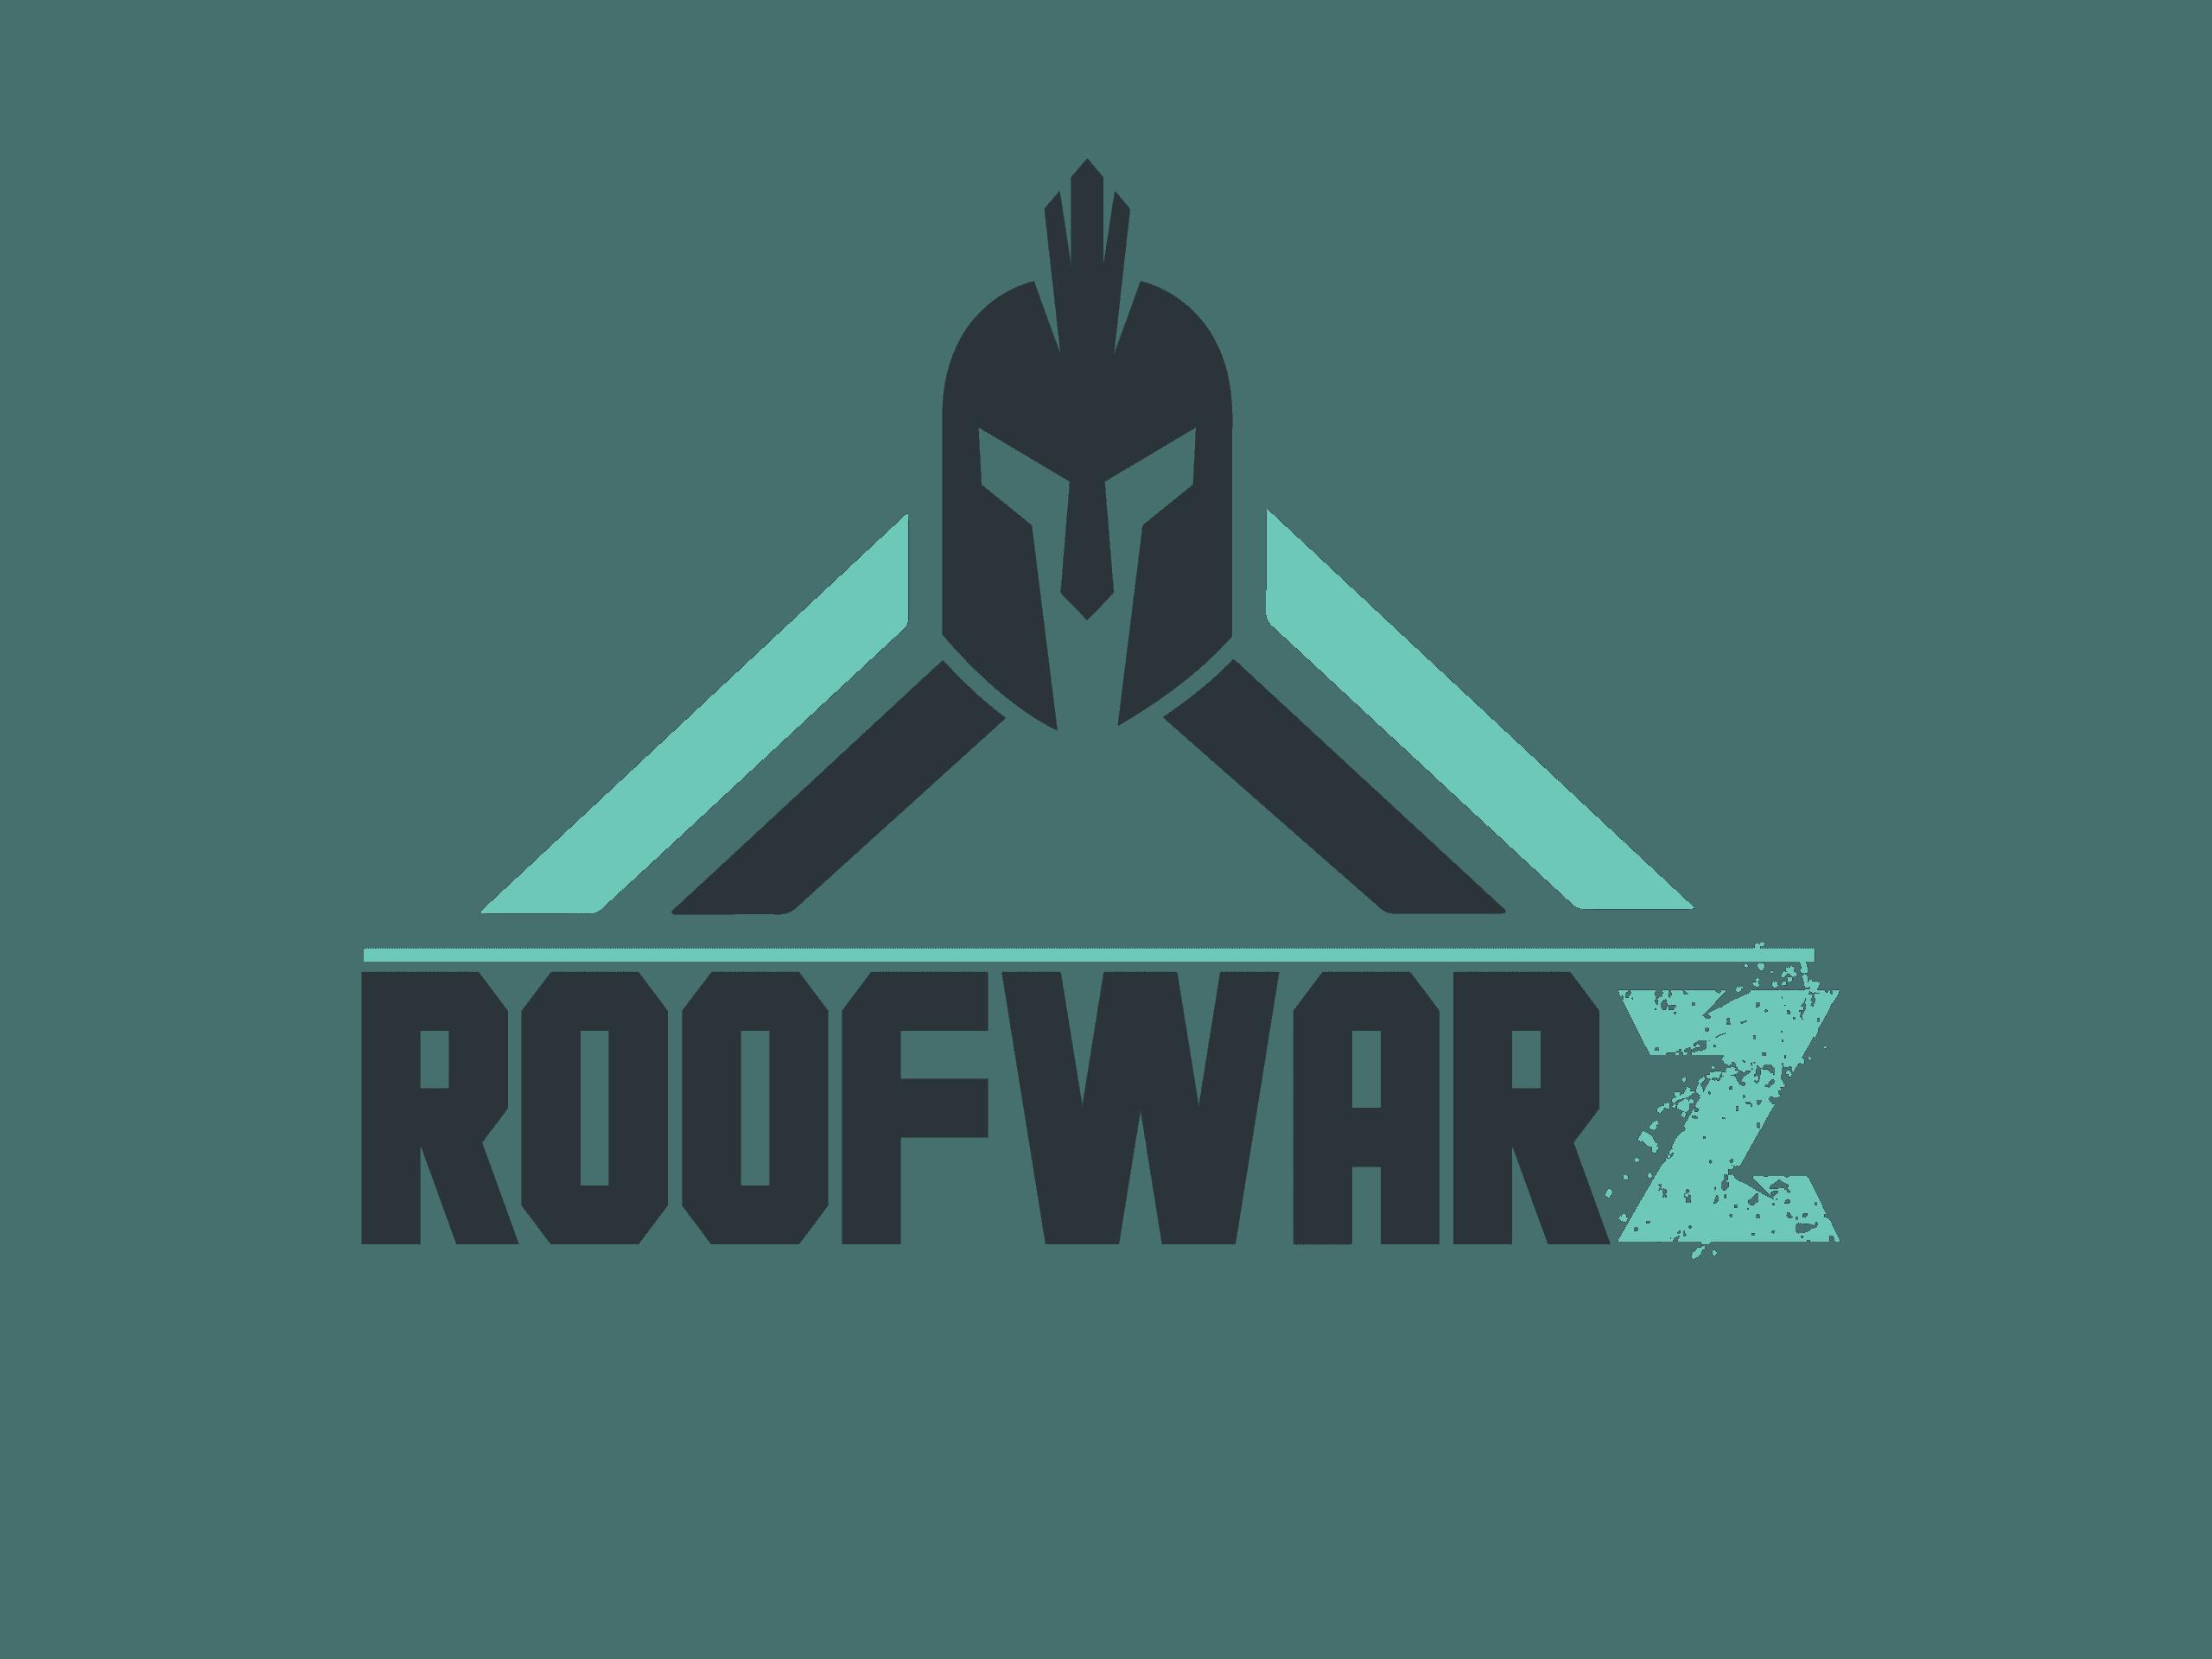 Roof Warz